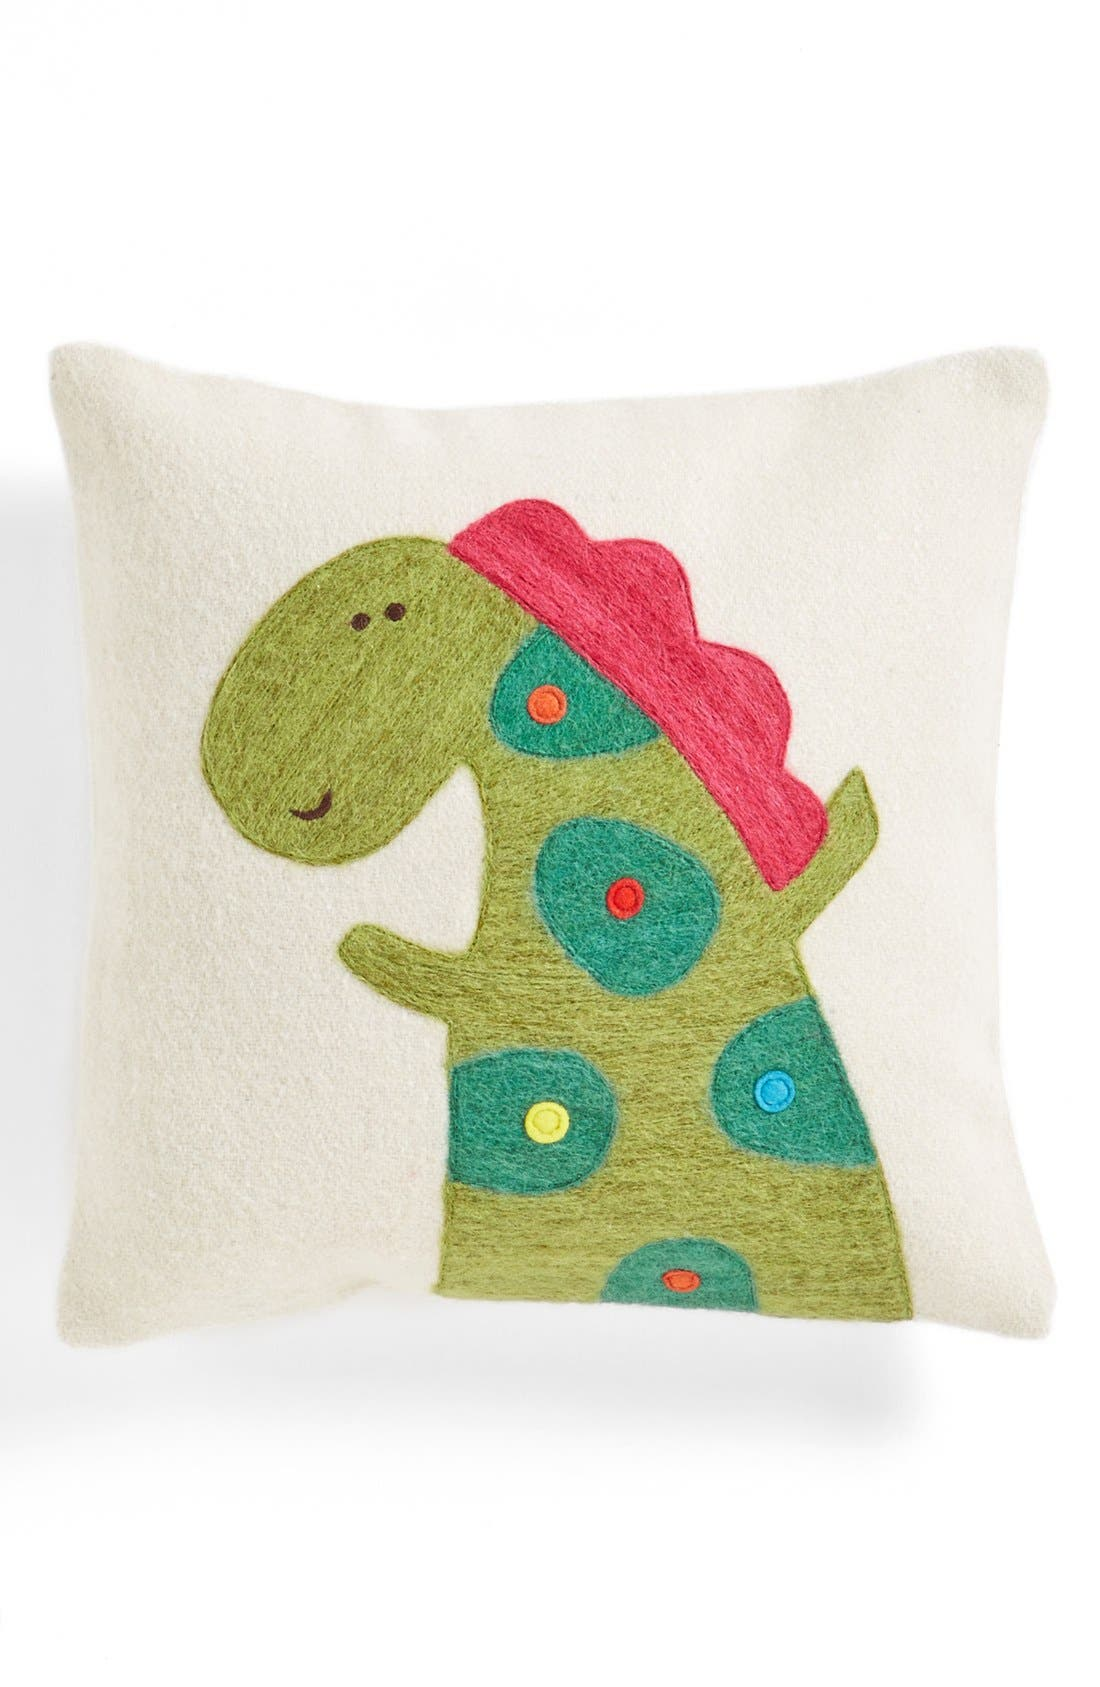 Main Image - Amity Home 'Alligator' Decorative Pillow